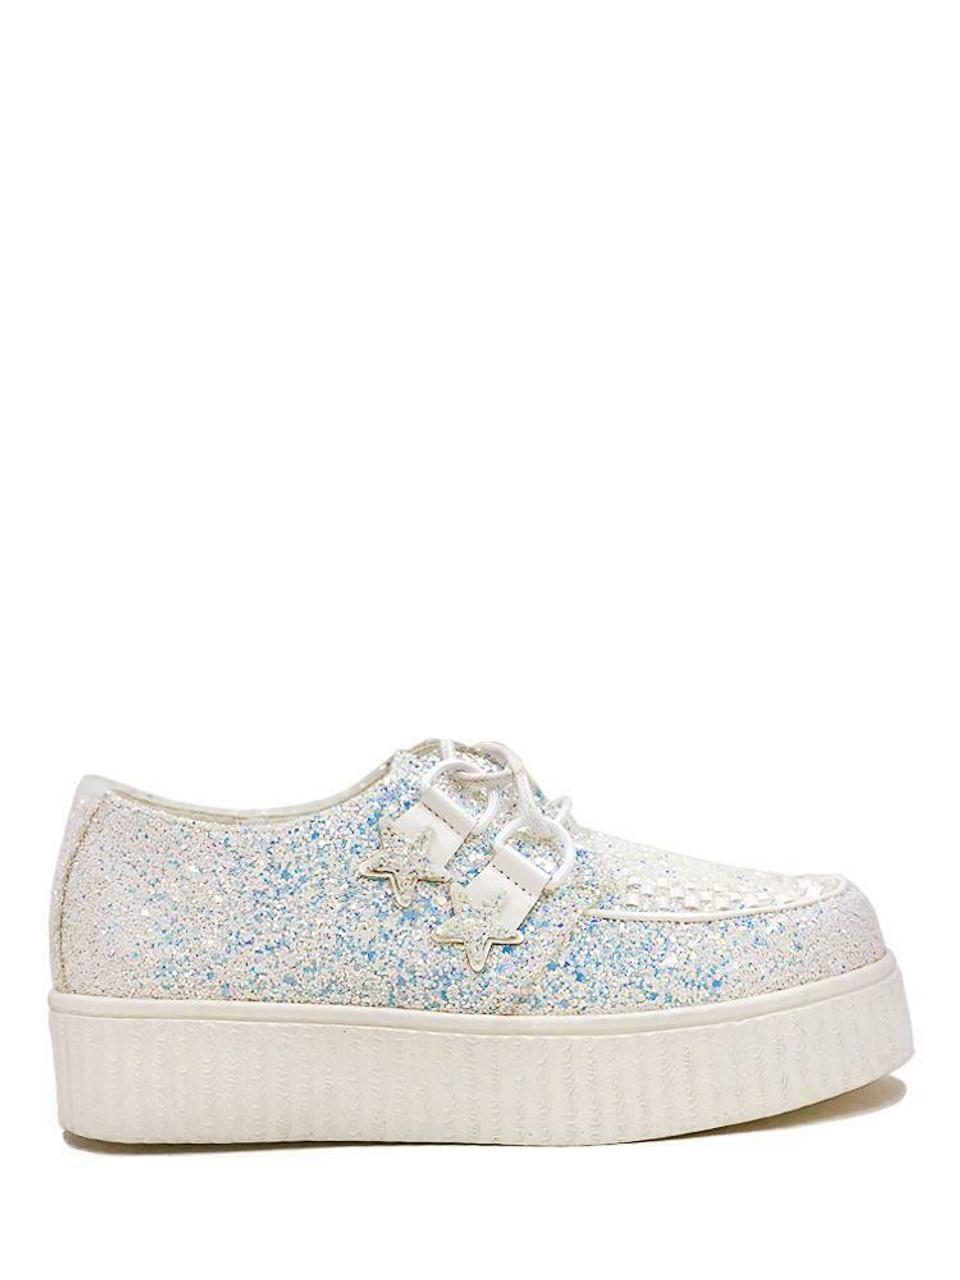 397cf7121dd7 YRU Strange Cvlt Cult Krypt Kreeper Creeper White Glitter Platforms Sneakers  - Fearless Apparel